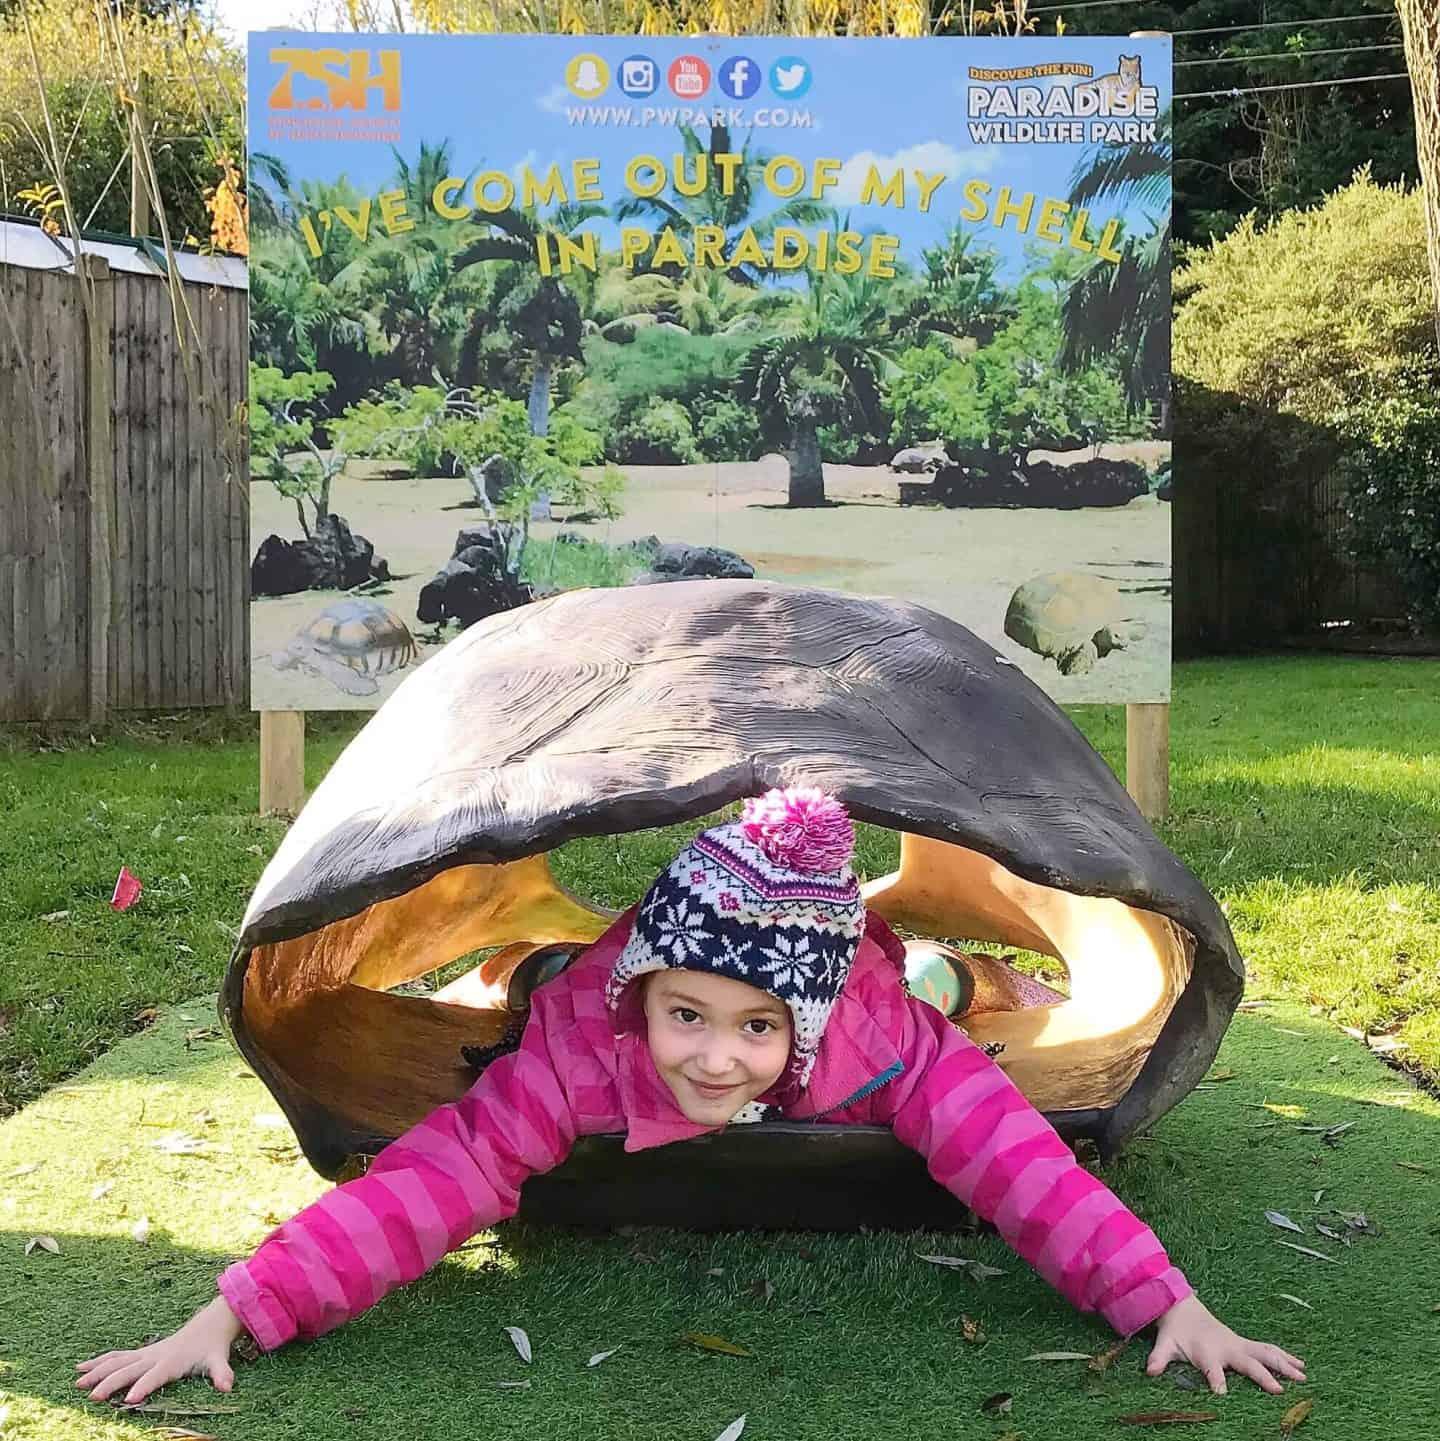 Tortoise fun at Paradise Wildlife Park, Hertfordshire